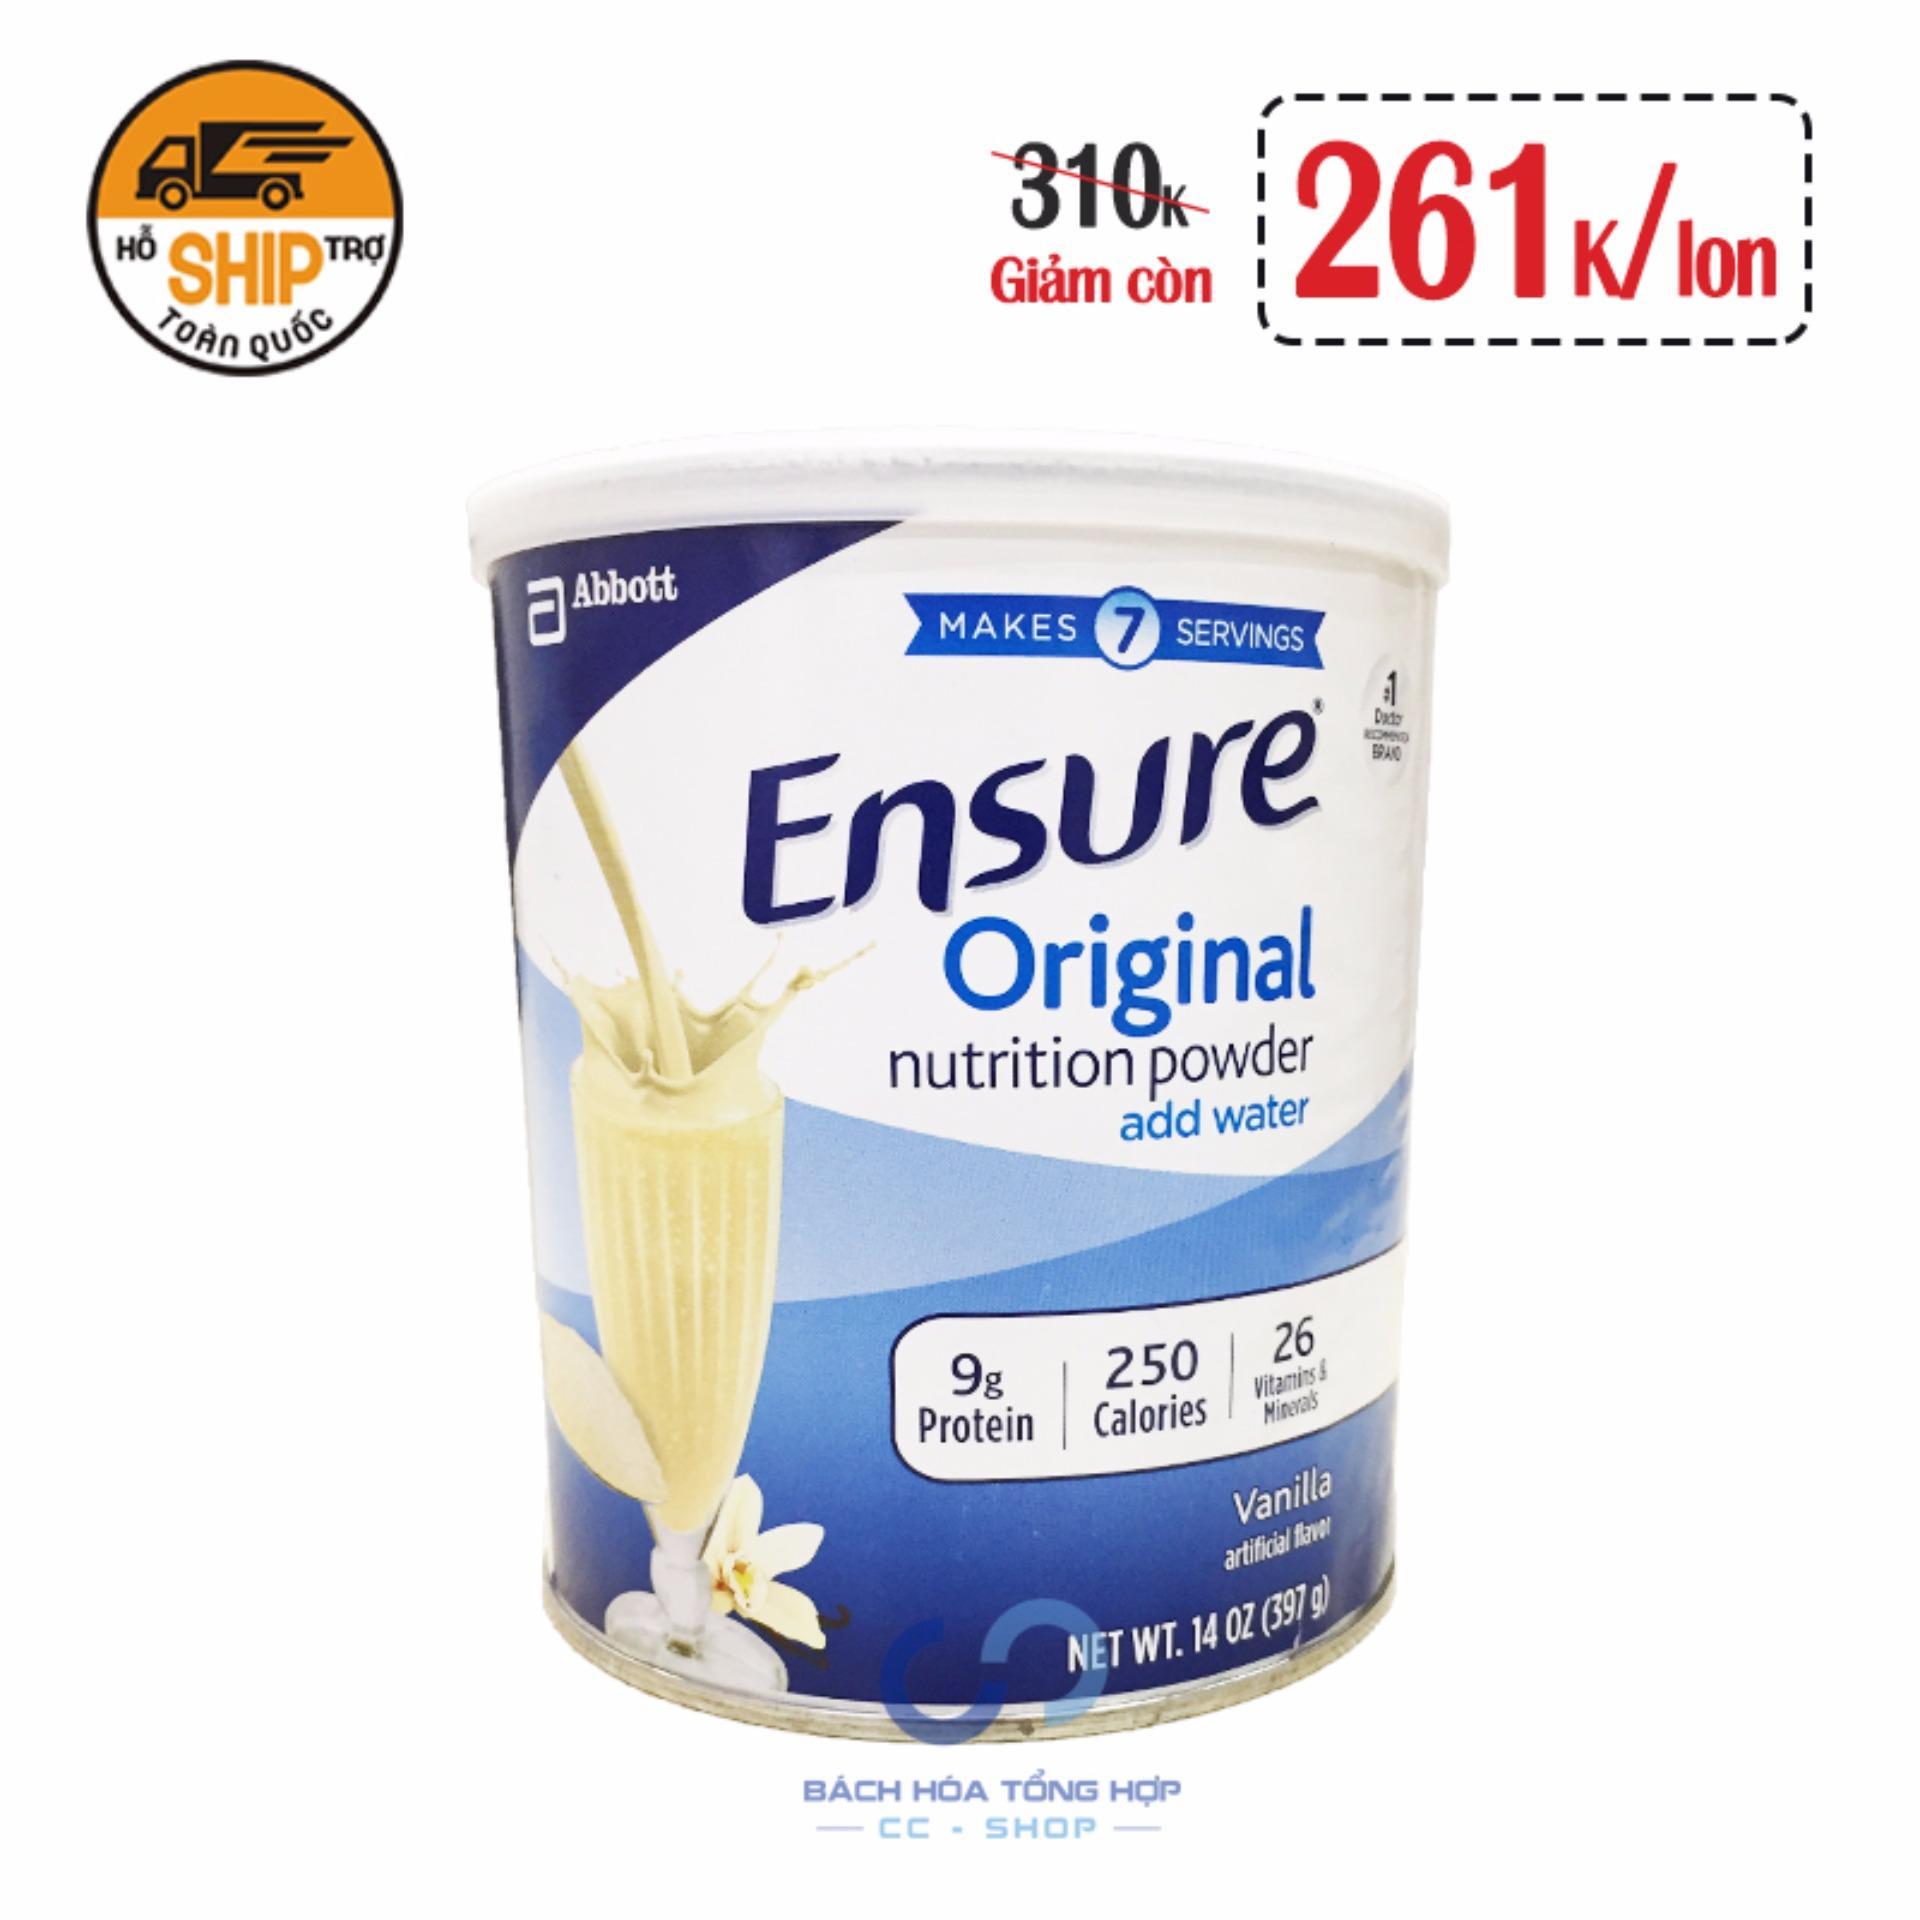 Hình ảnh Sữa Ensure Original Nutrition Powder (379g)